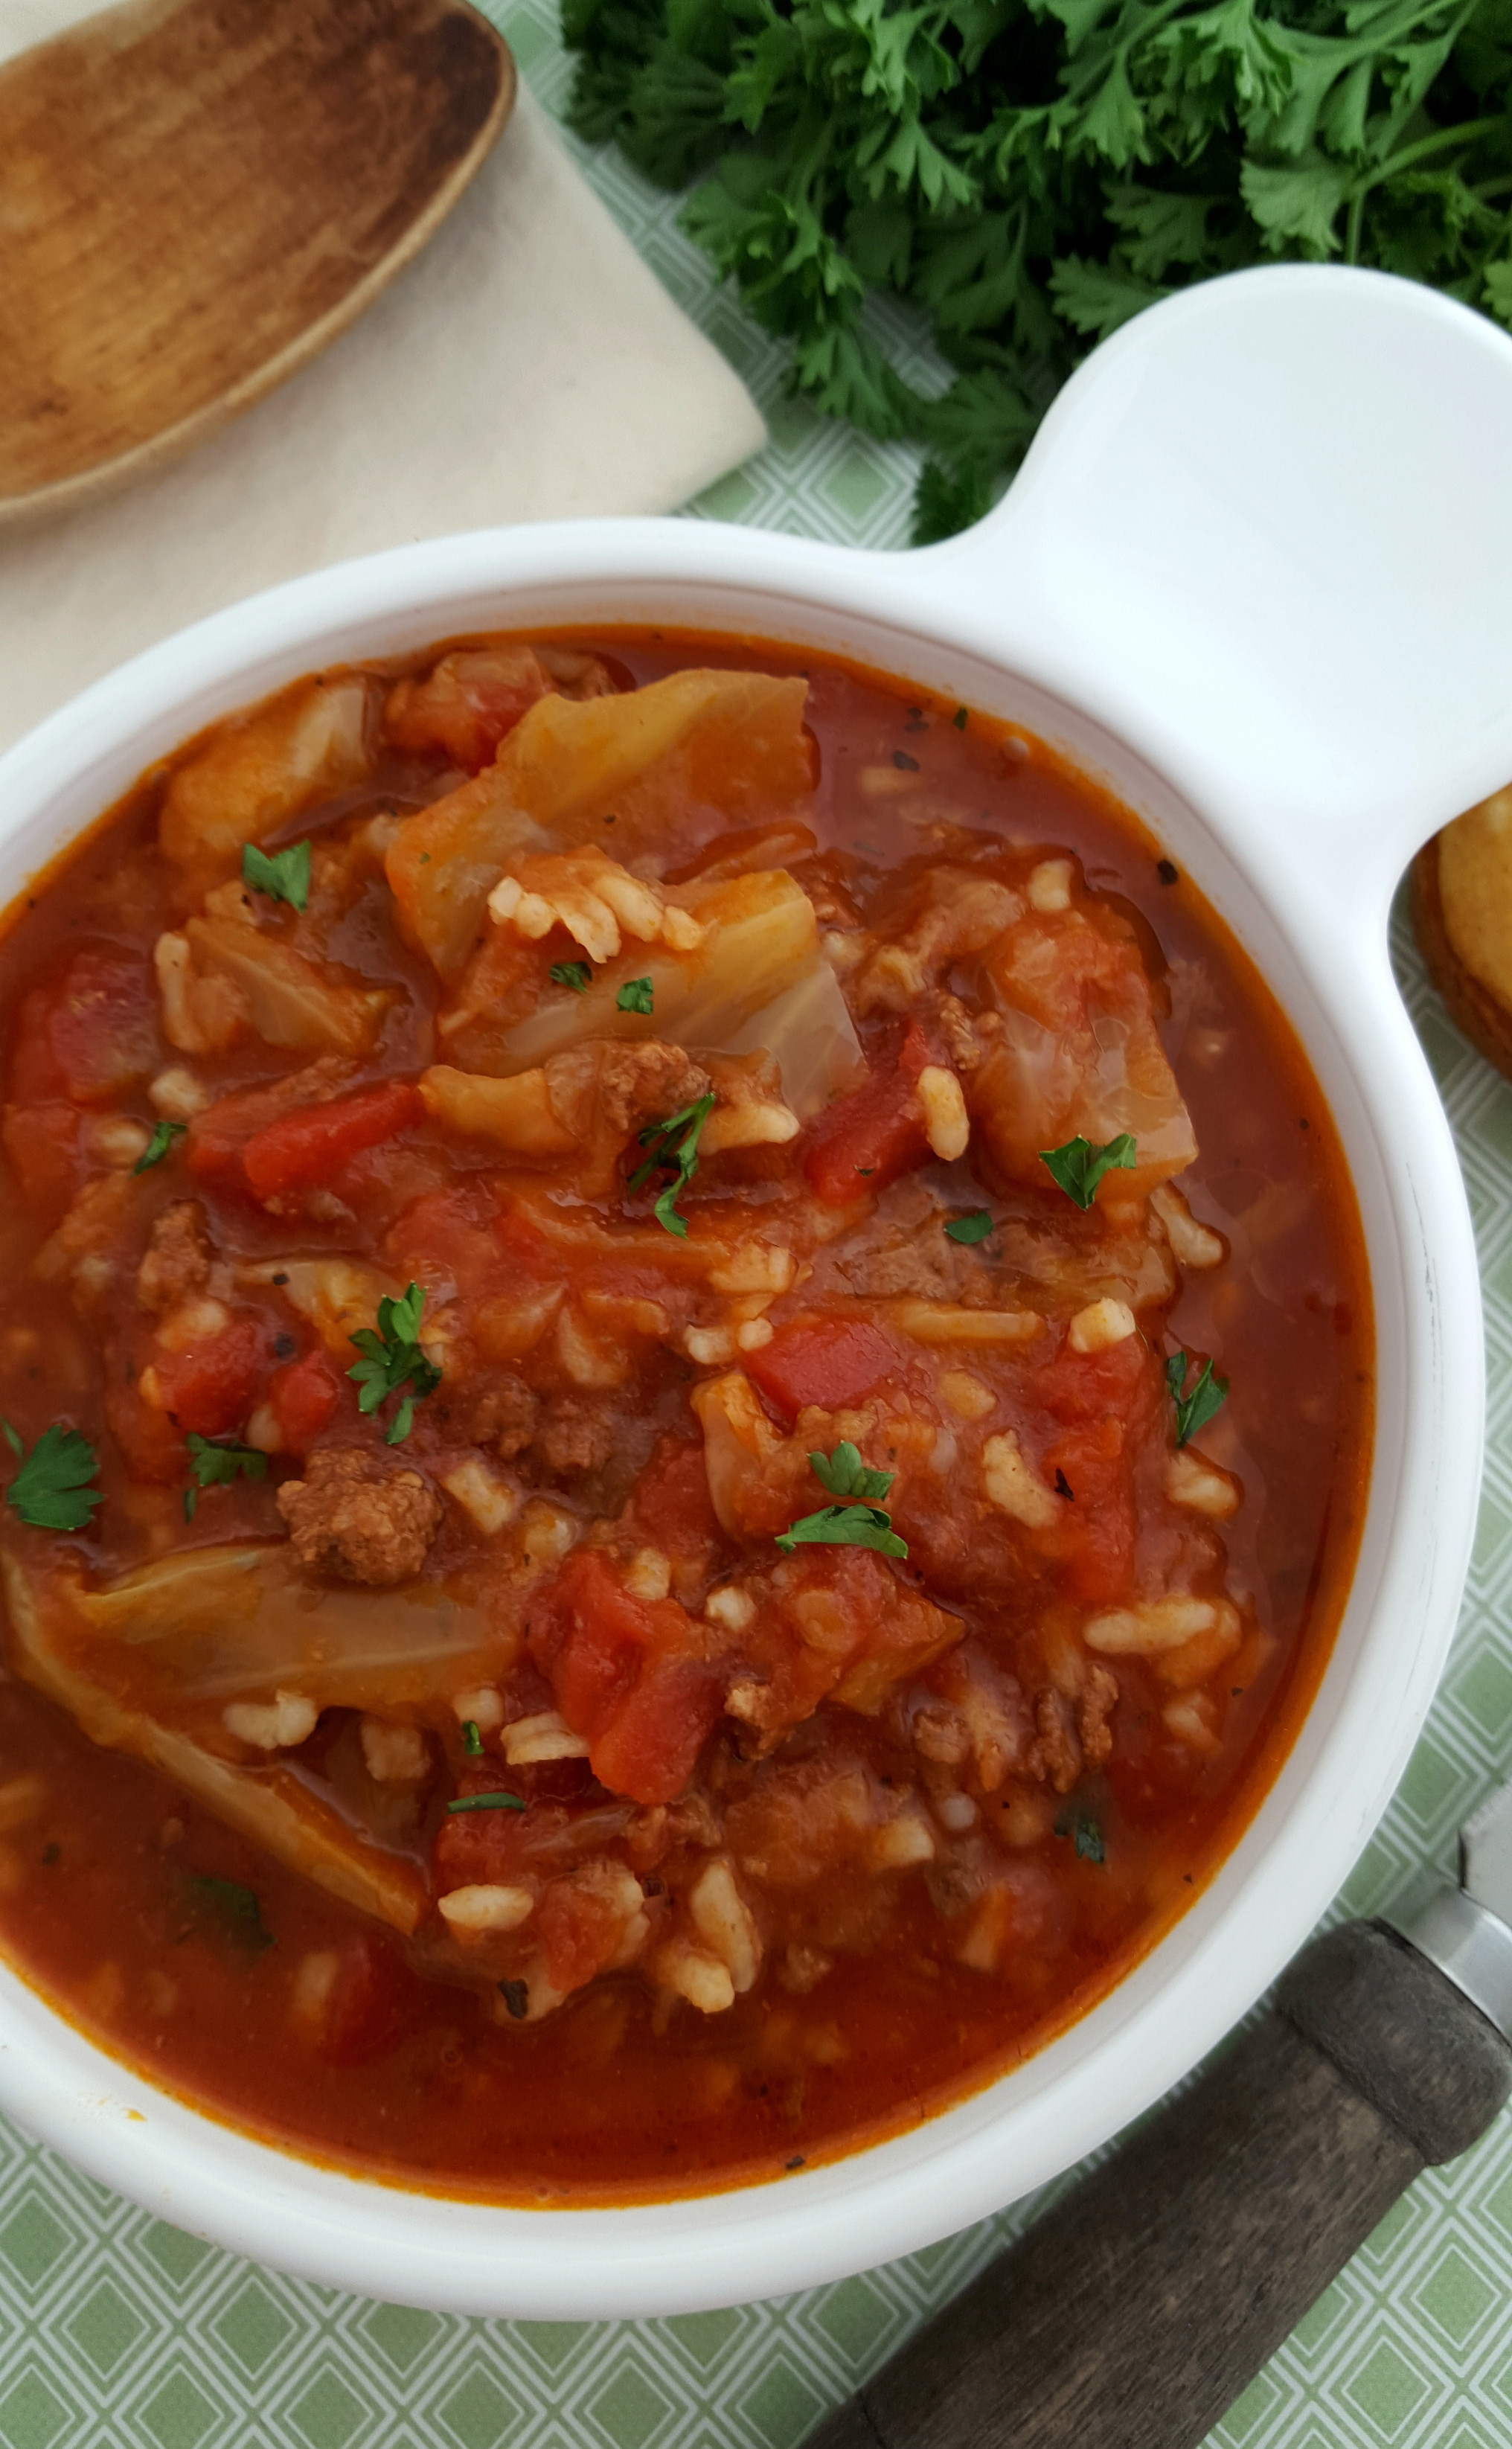 Crockpot Cabbage Soup  Crock Pot Cabbage Roll Soup A Spark of Creativity